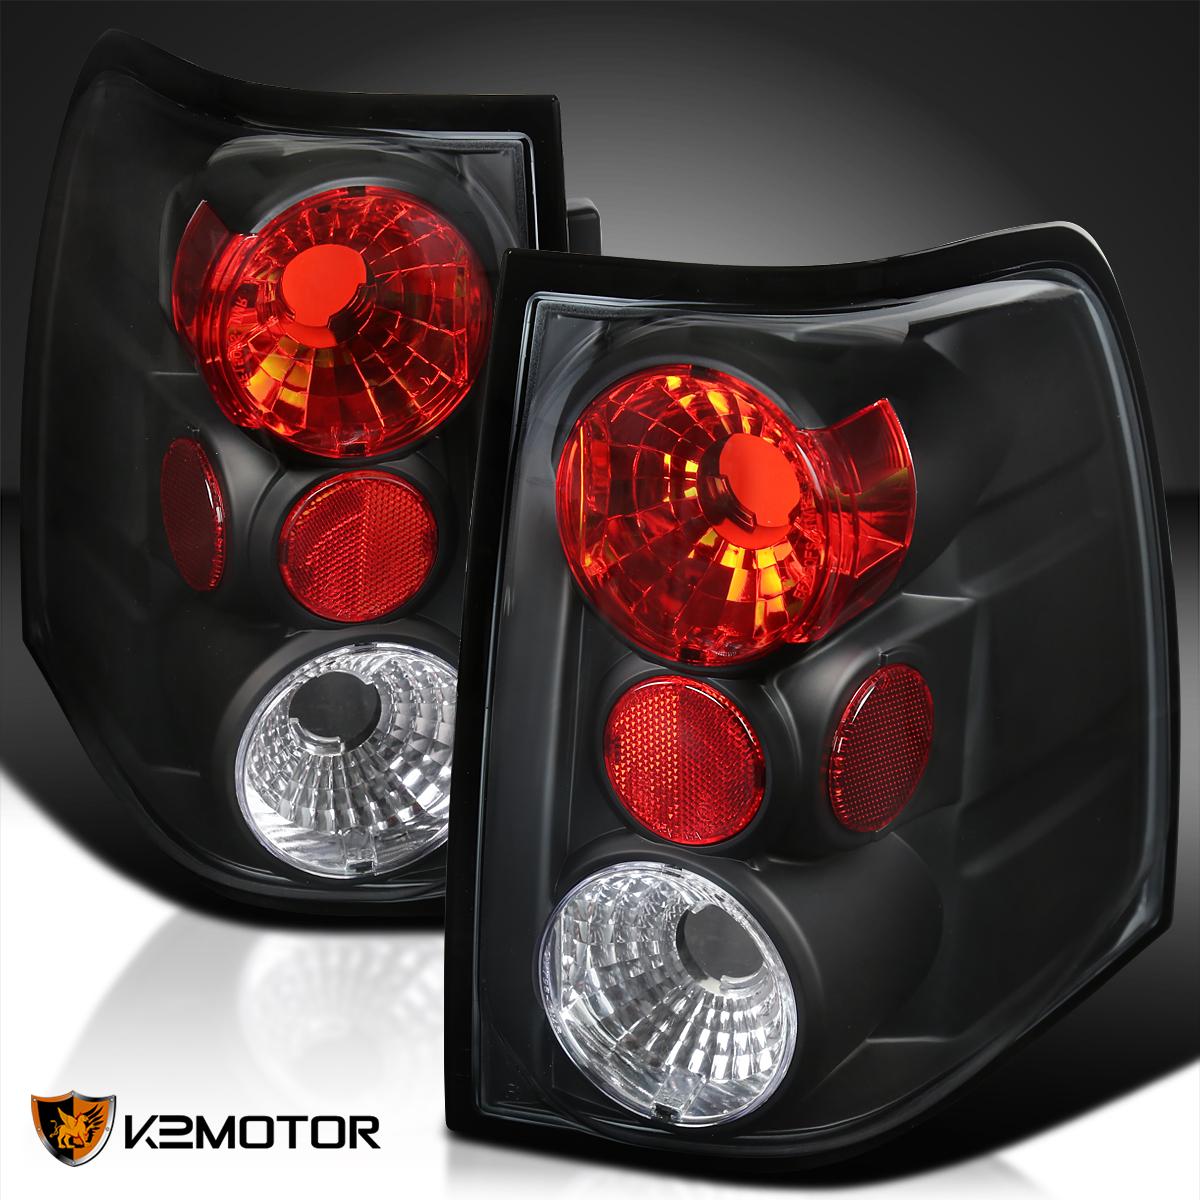 New Bumper Face Bar Reflector Rear Driver Left Side LH For Honda CR-V Acura RDX